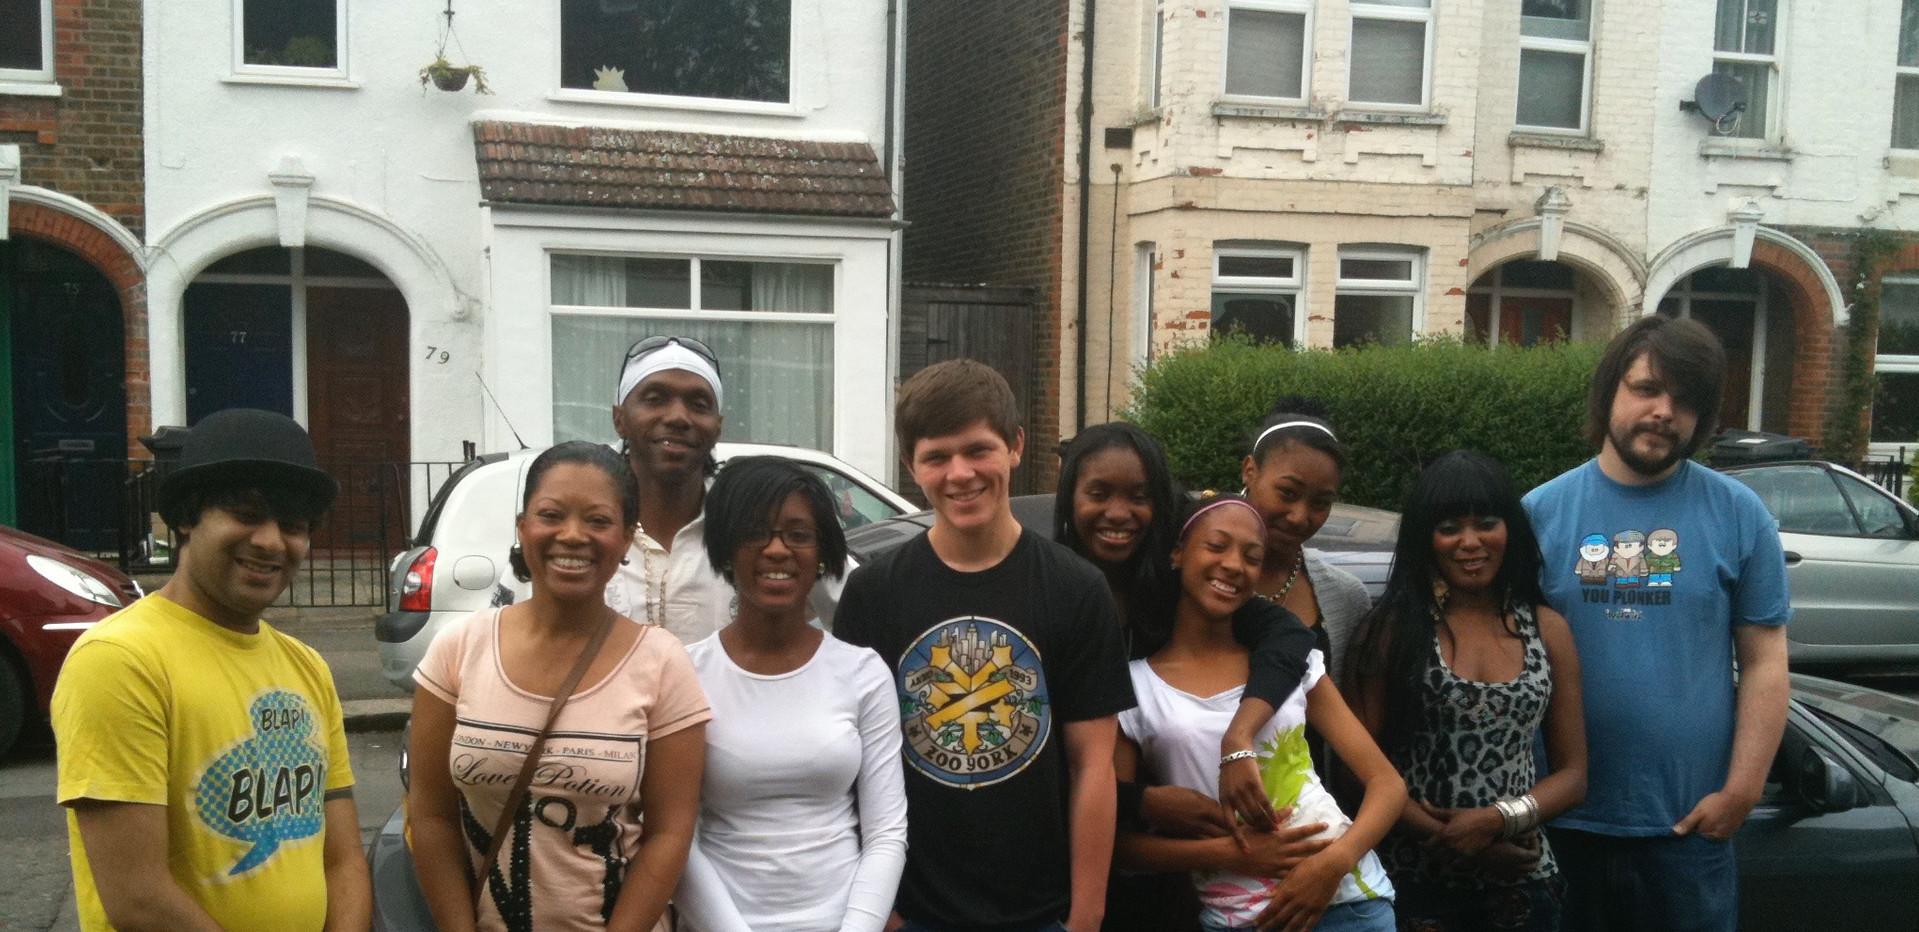 Cast members: Move Ya Shoulder videoshoot 2011